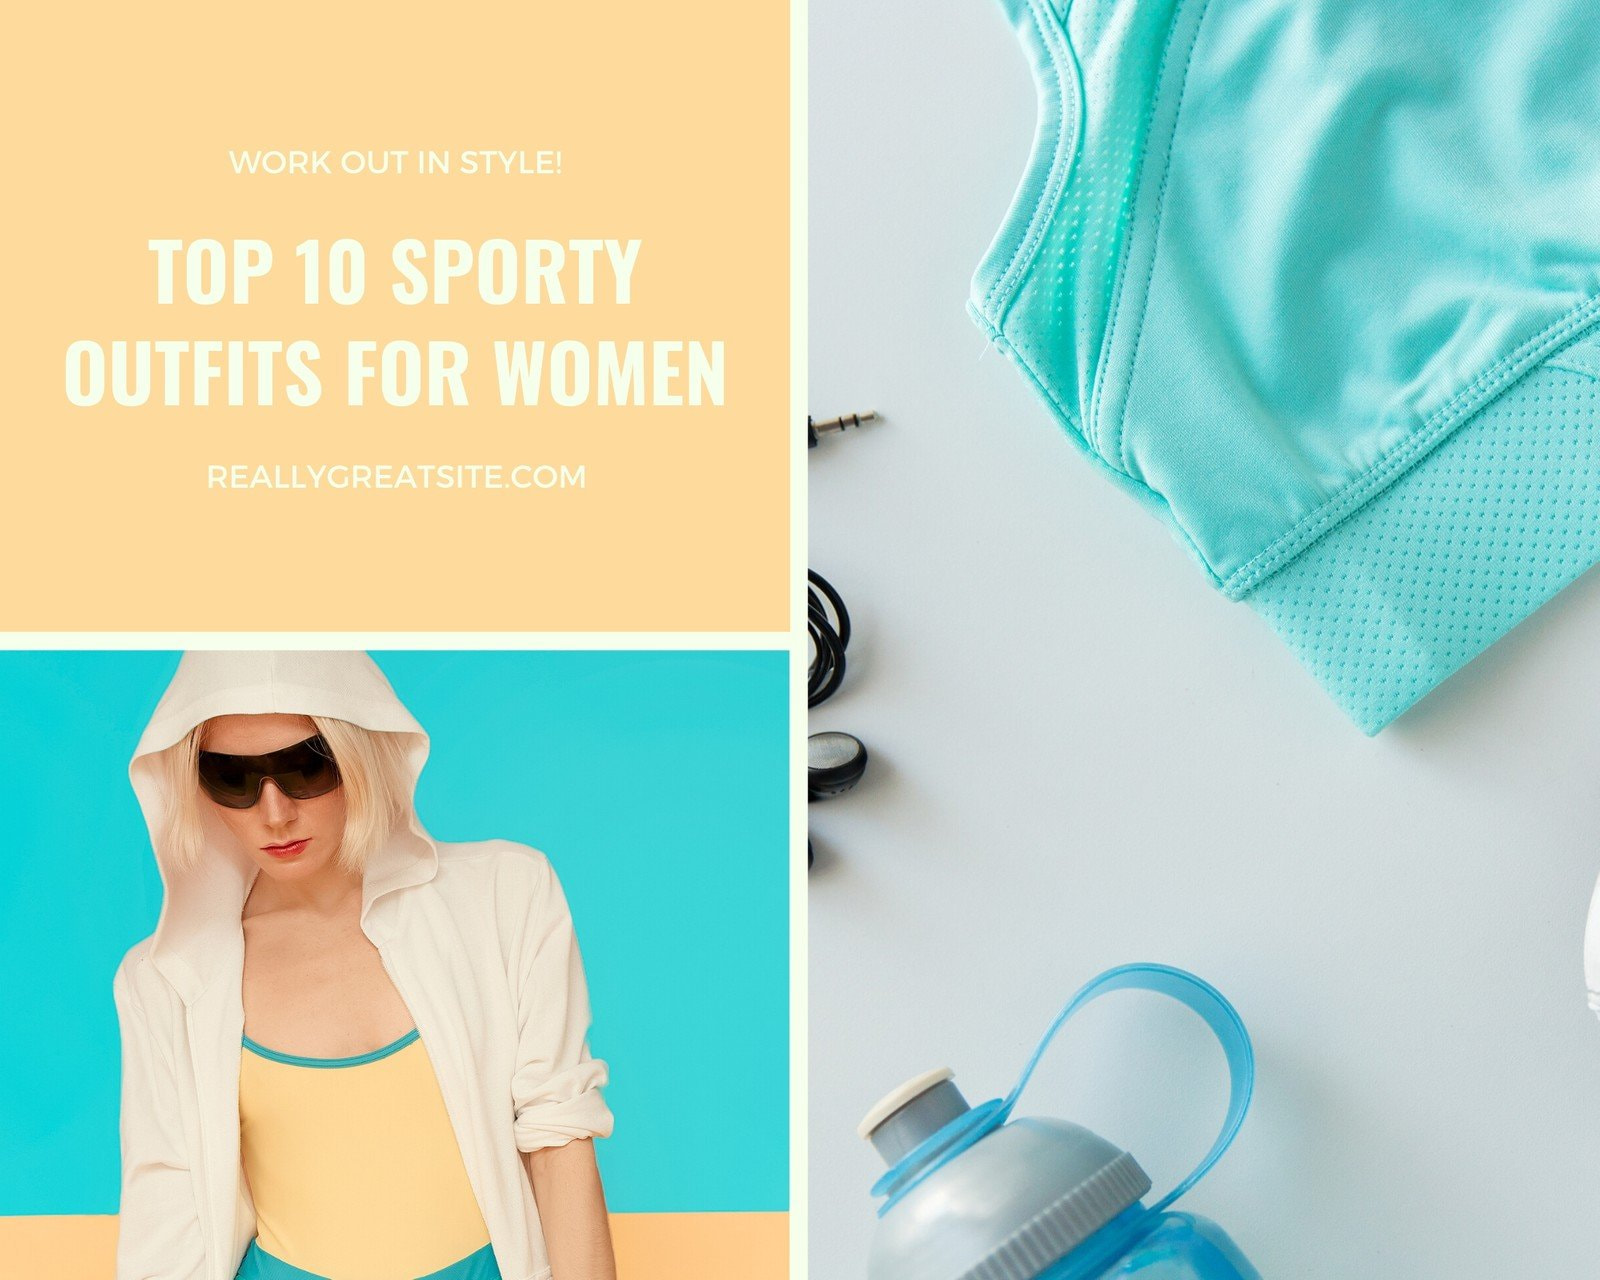 Fashionable Sportswear Photo Collage